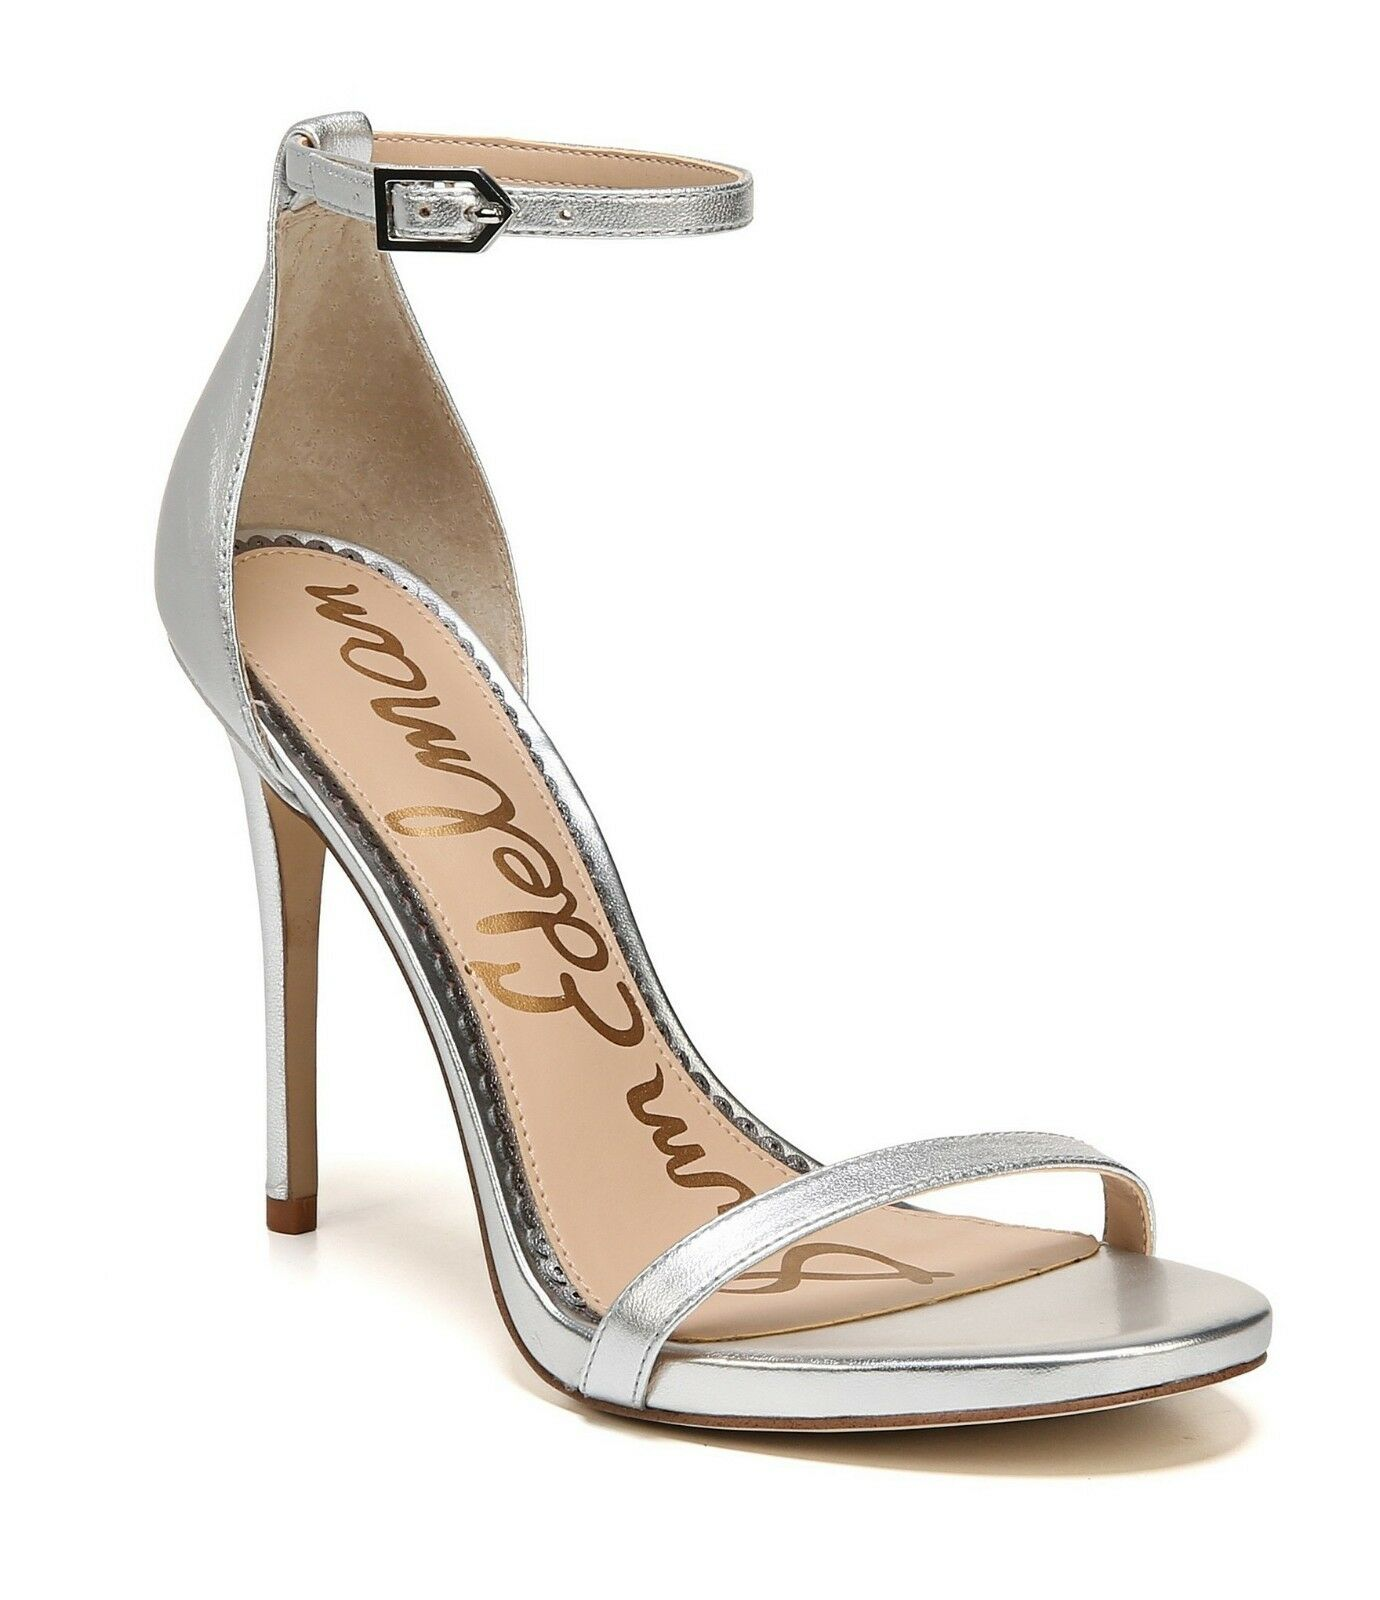 Sam Edelman Edelman Edelman NADYA Metallic Leather Ankle Heel Sandal schuhe Soft Silber 8.5 39 cae679